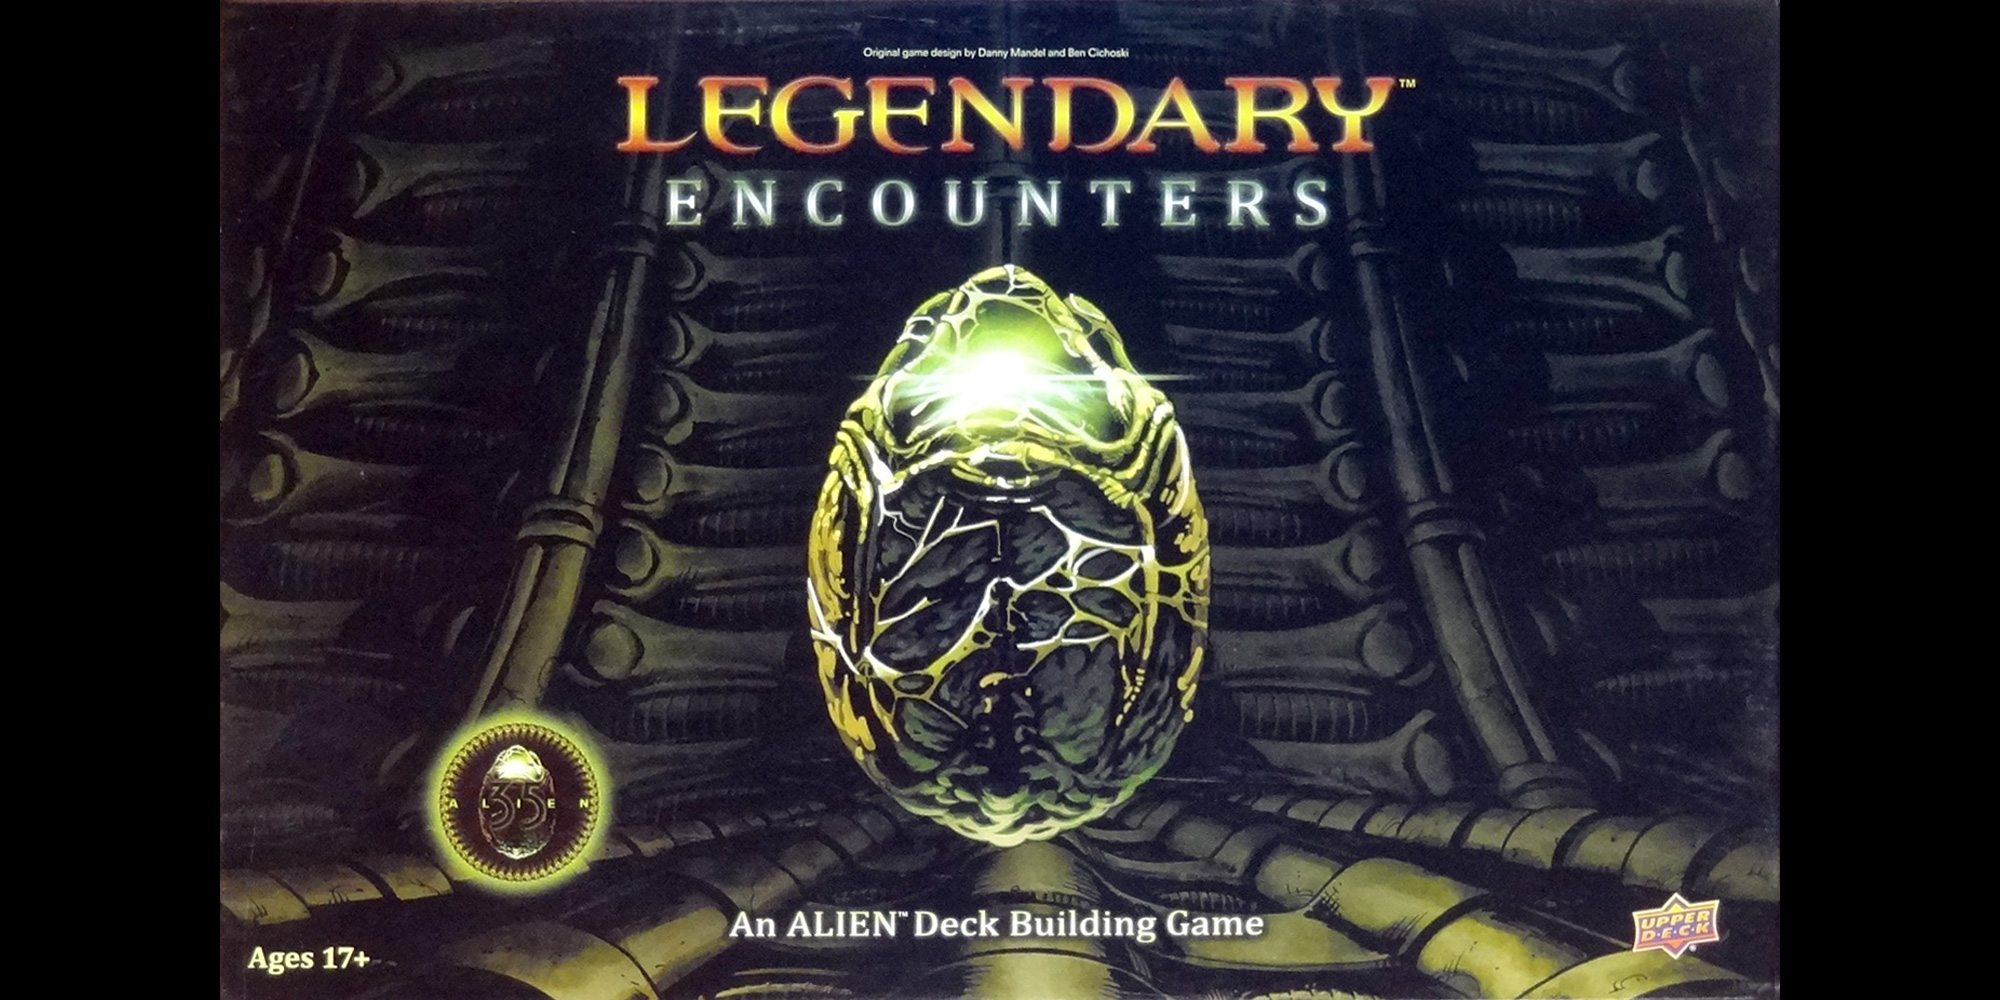 LegendaryEncounters